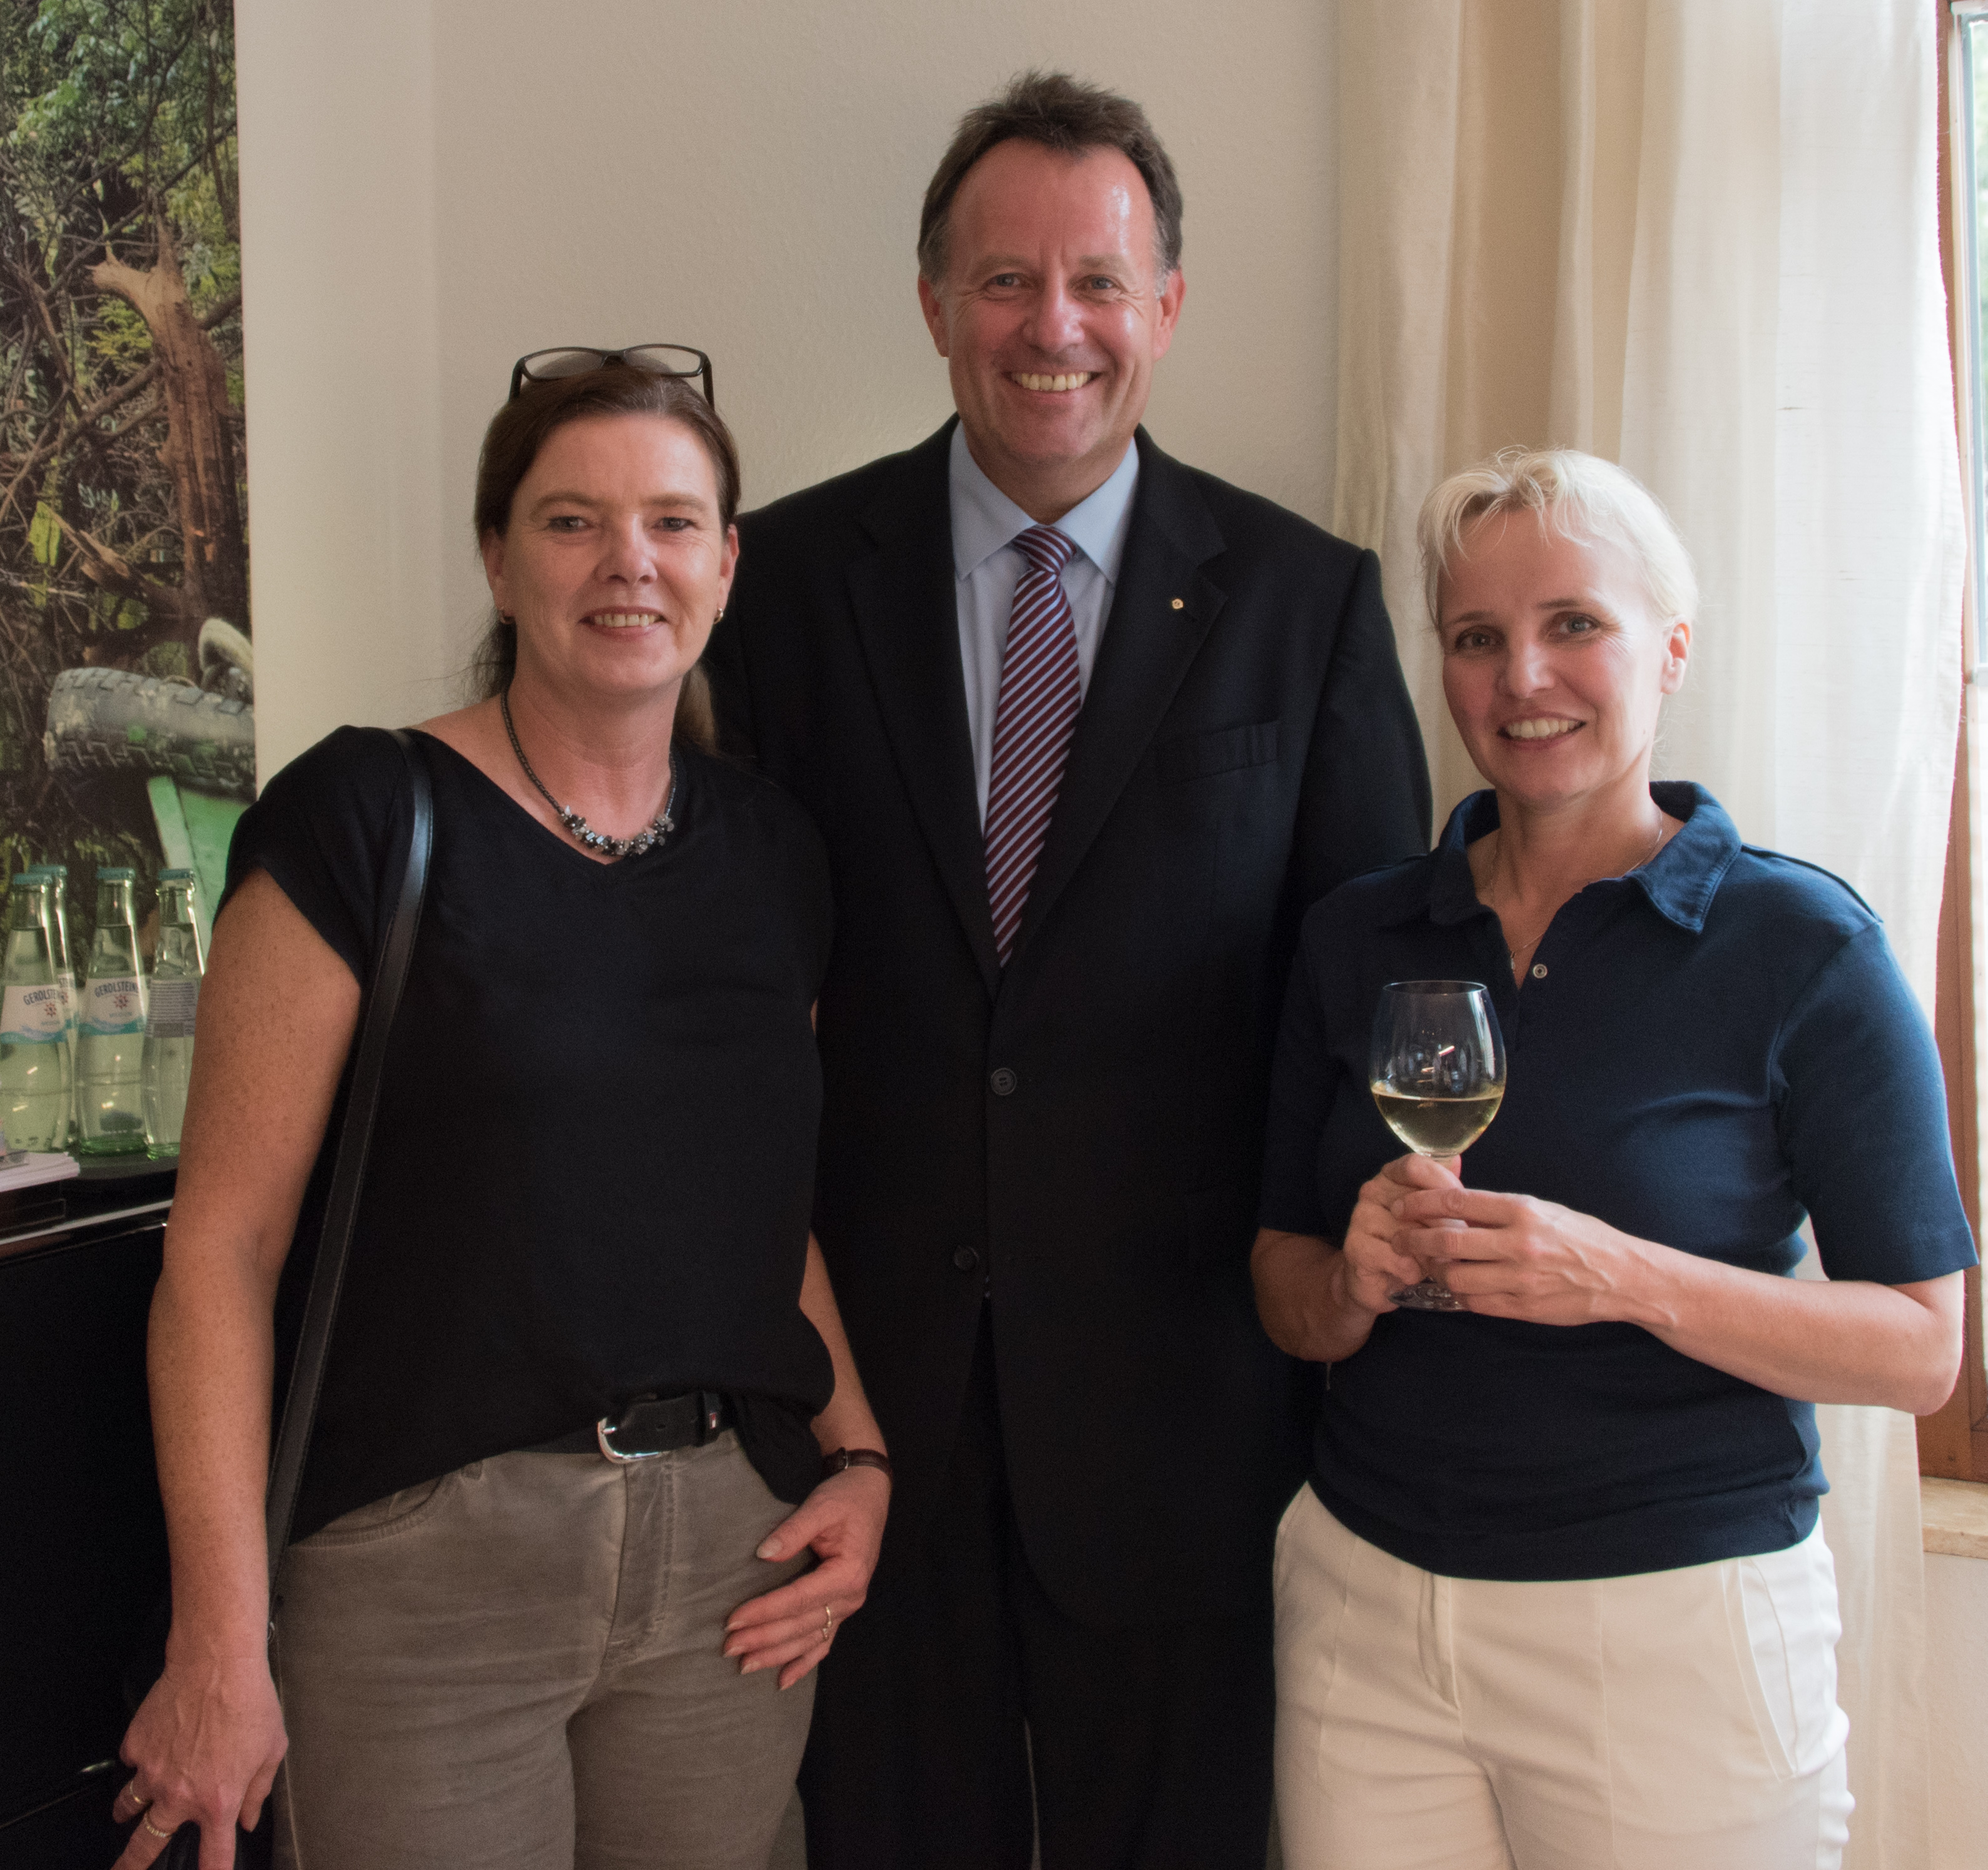 Ilona Niemann, Dirk Breuckmann, Bianca Rosenhagen